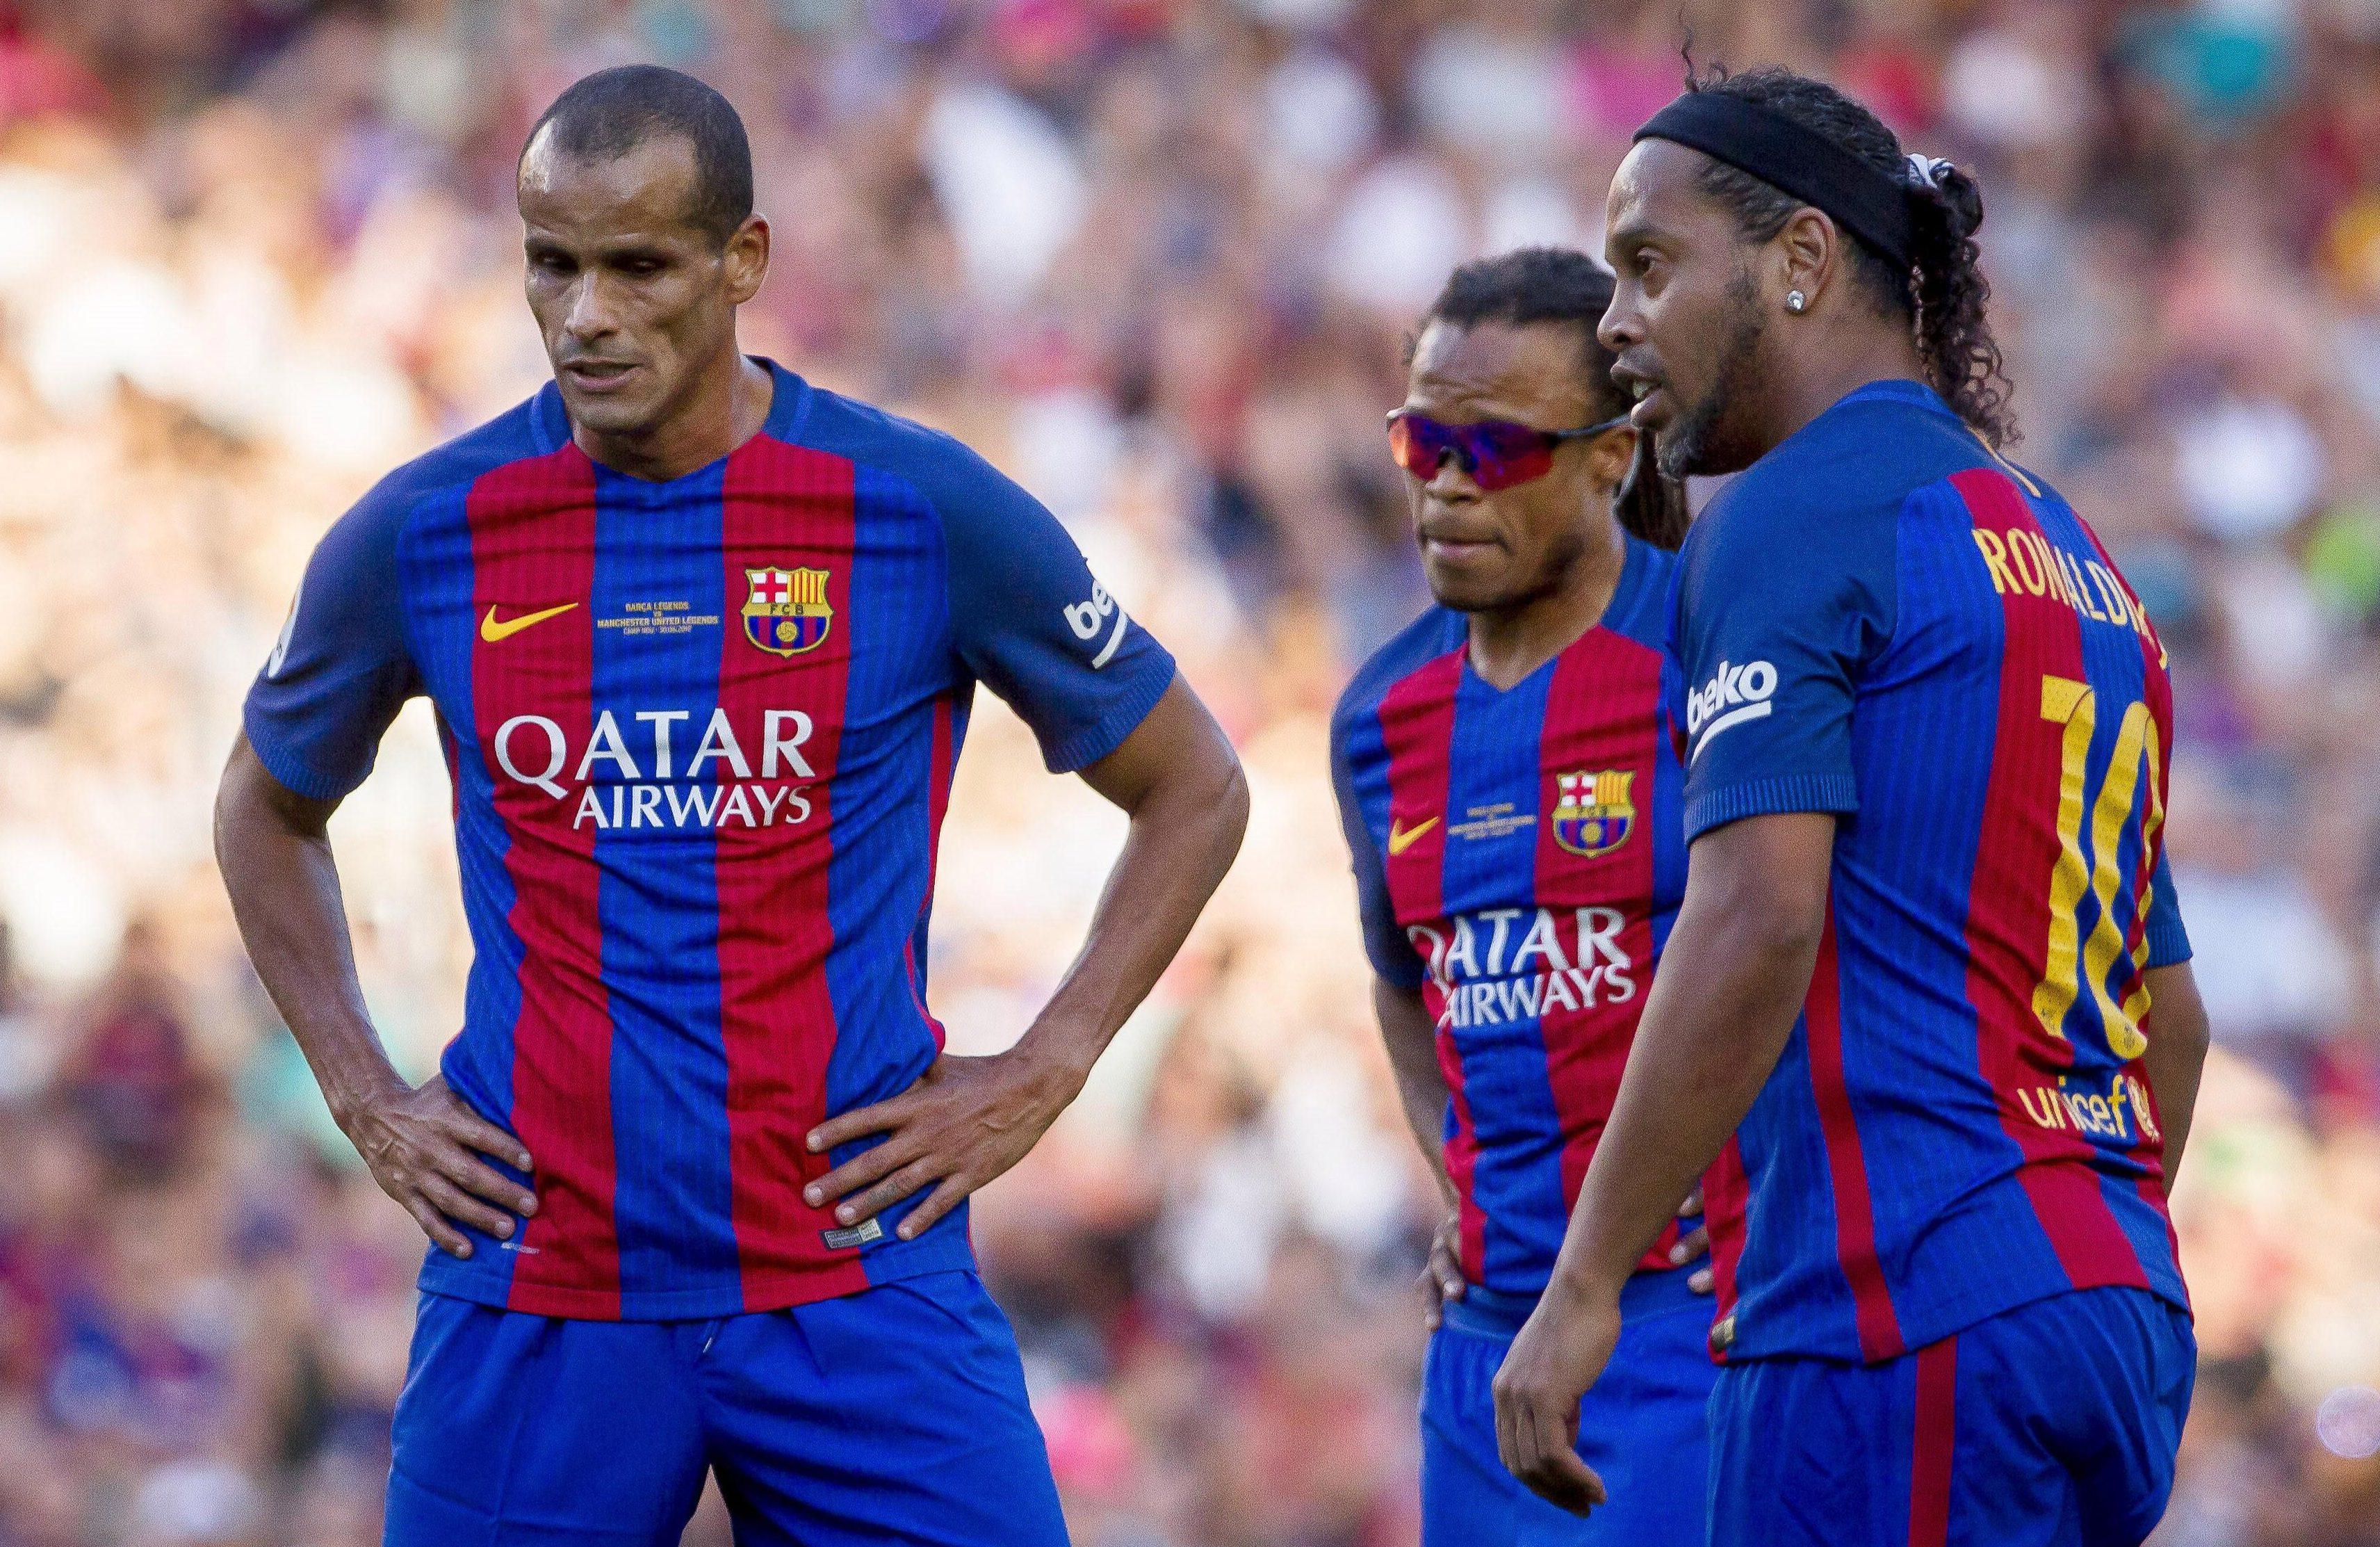 Rivaldo, Ronaldinho and Edgar Davids gather over a free-kick at the Nou Camp in 2017